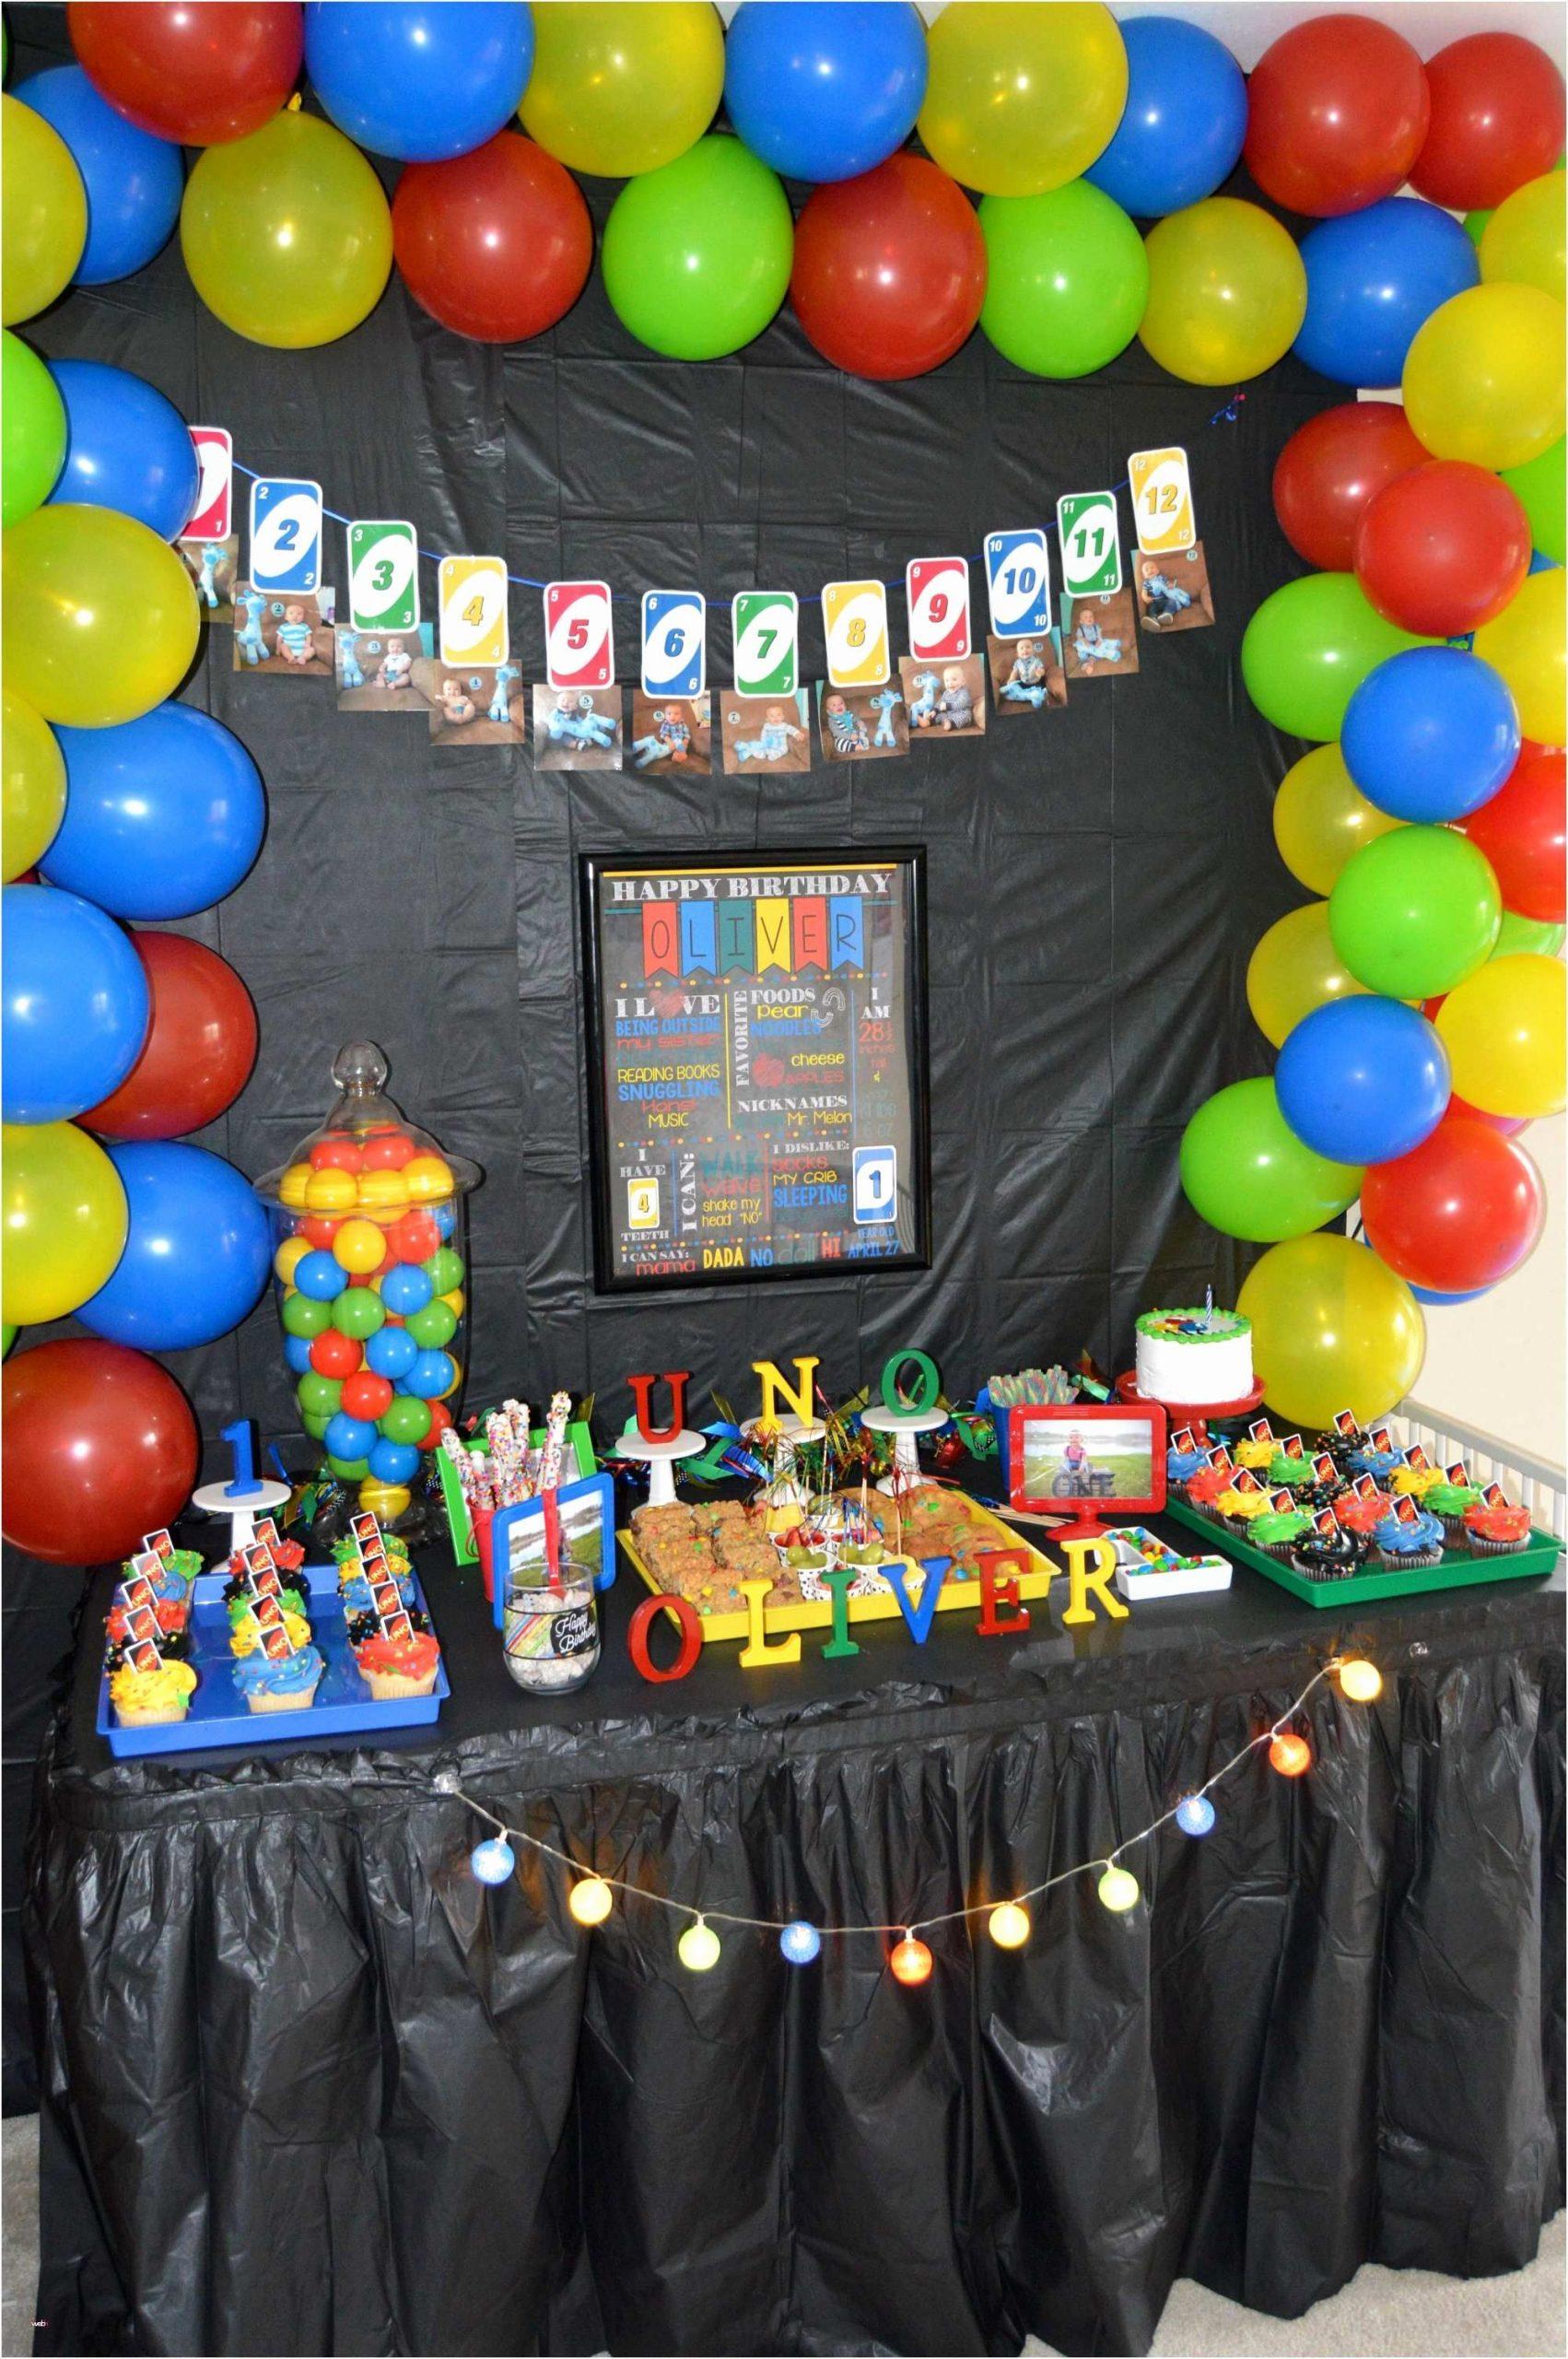 Birthday Decoration Ideas for 1 Year Old Boy New 5 Year Old Birthday Party Ideas